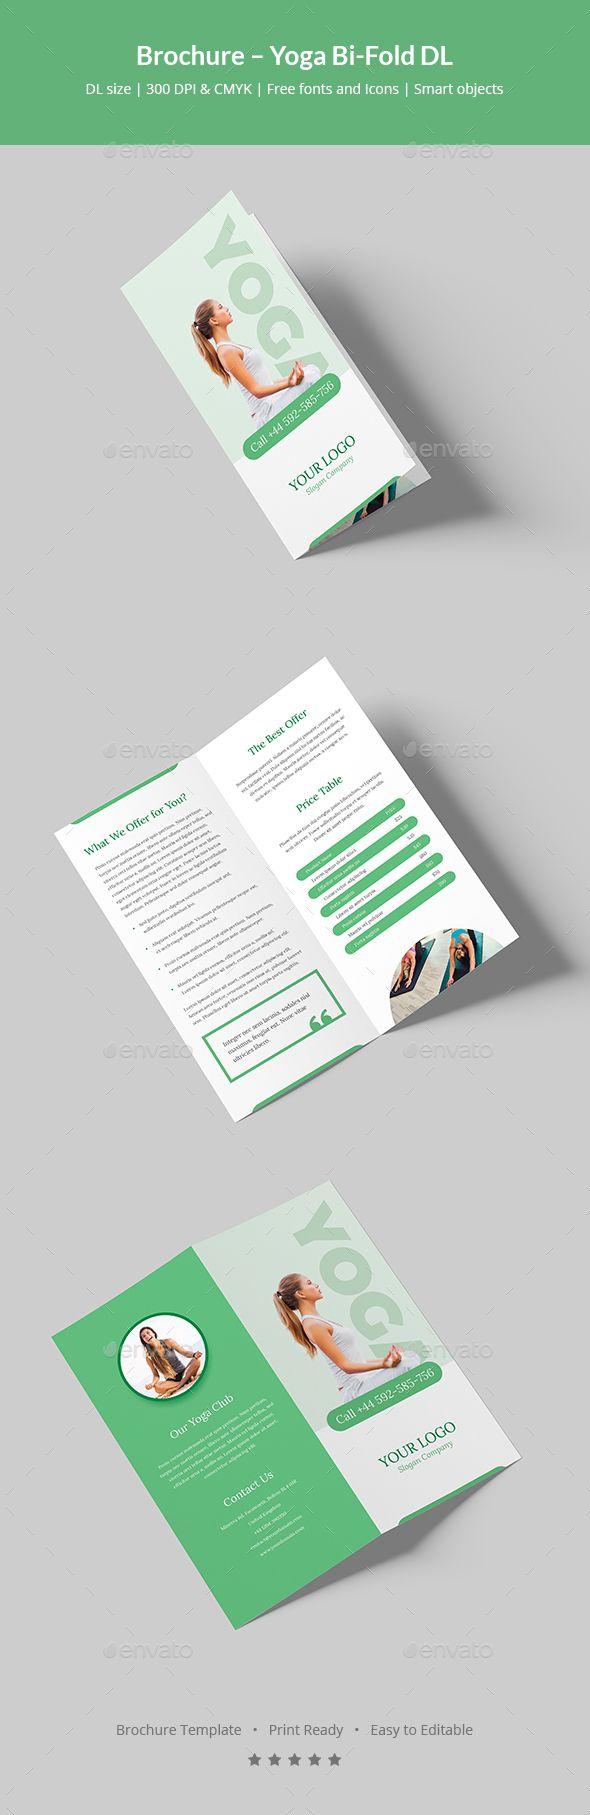 dl brochure template - 25 gorgeous brochure template ideas on pinterest